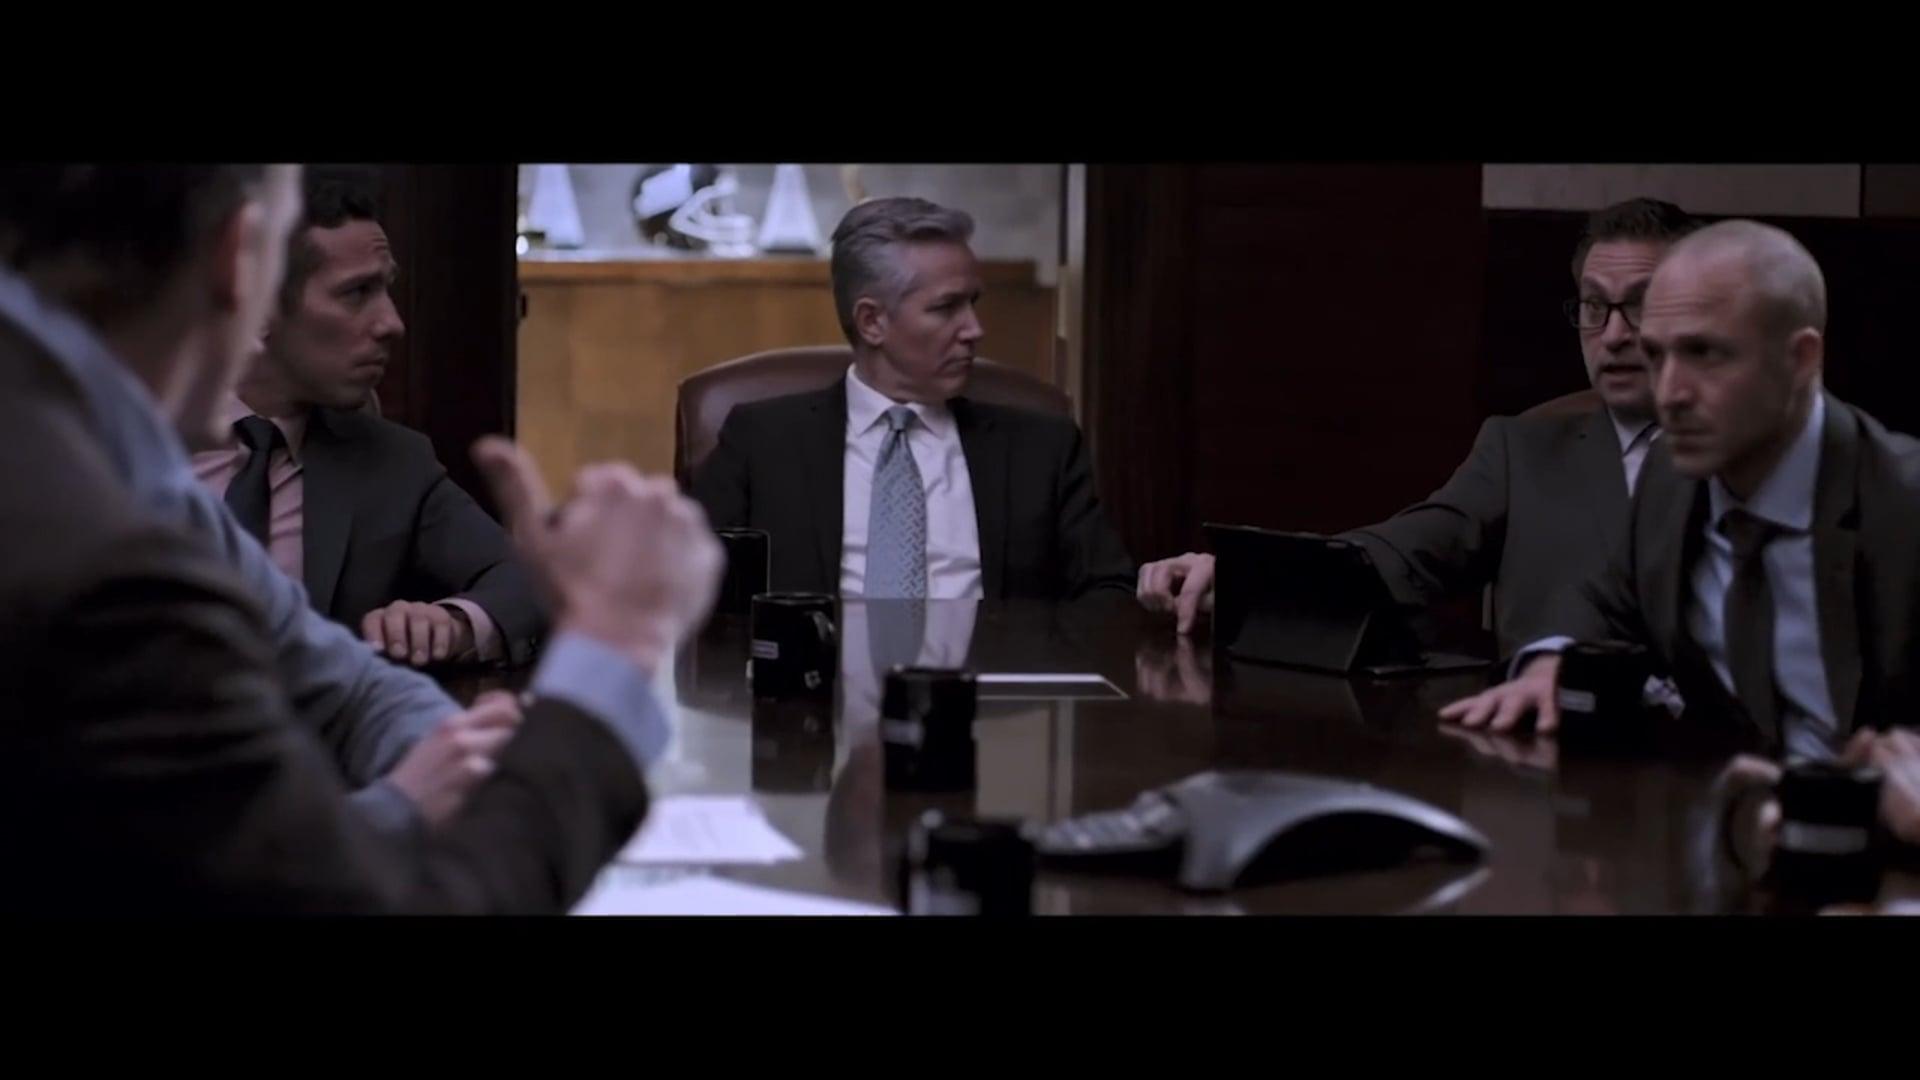 Glenn Thayer, John Malkovich, and Peyton Manning for Super Bowl LIII